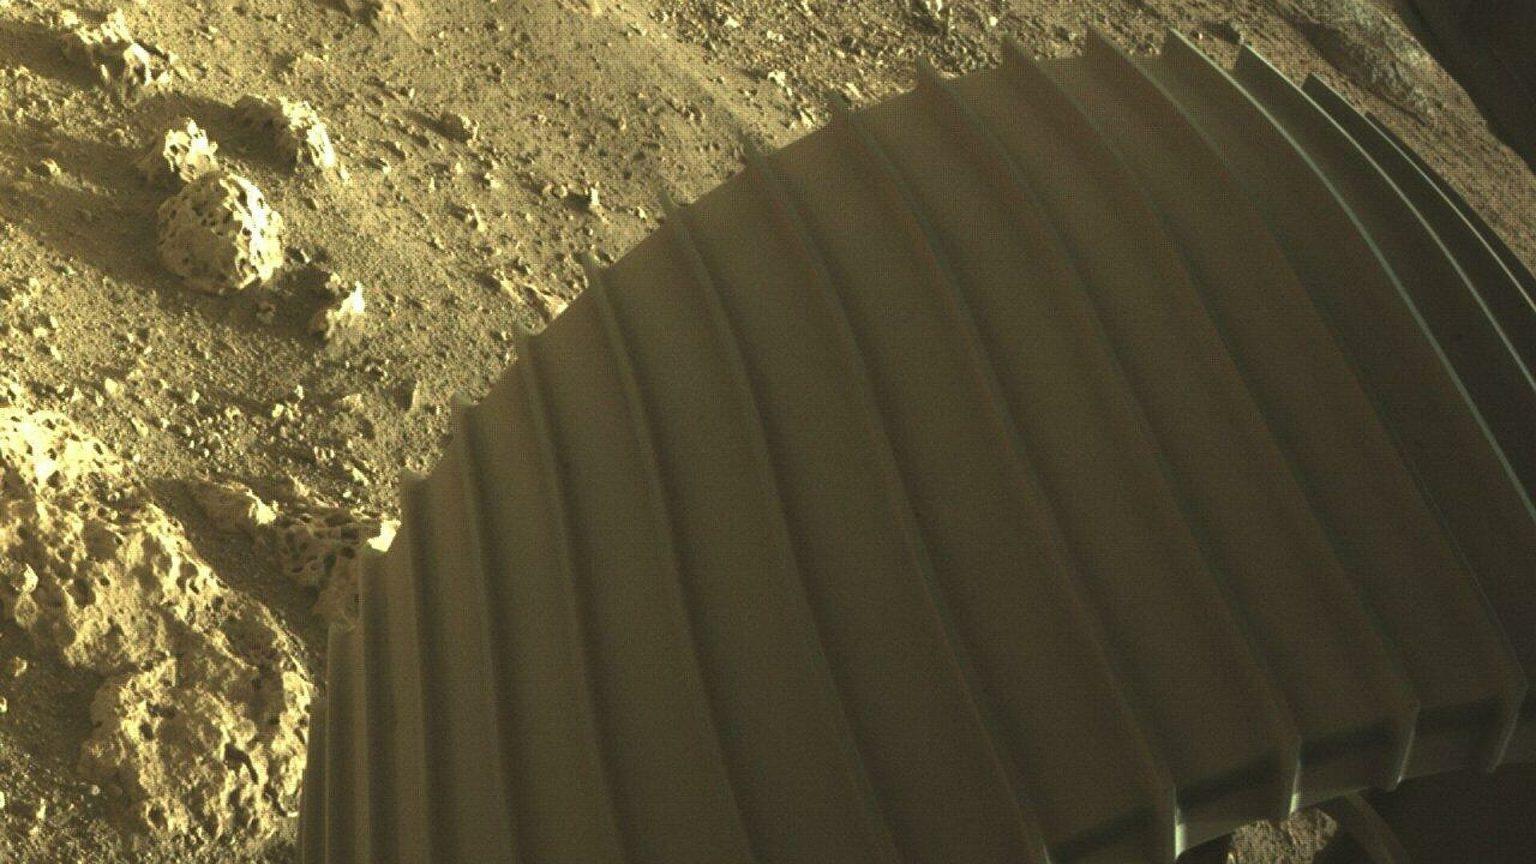 Вышла первая запись звука с Марса — аудио